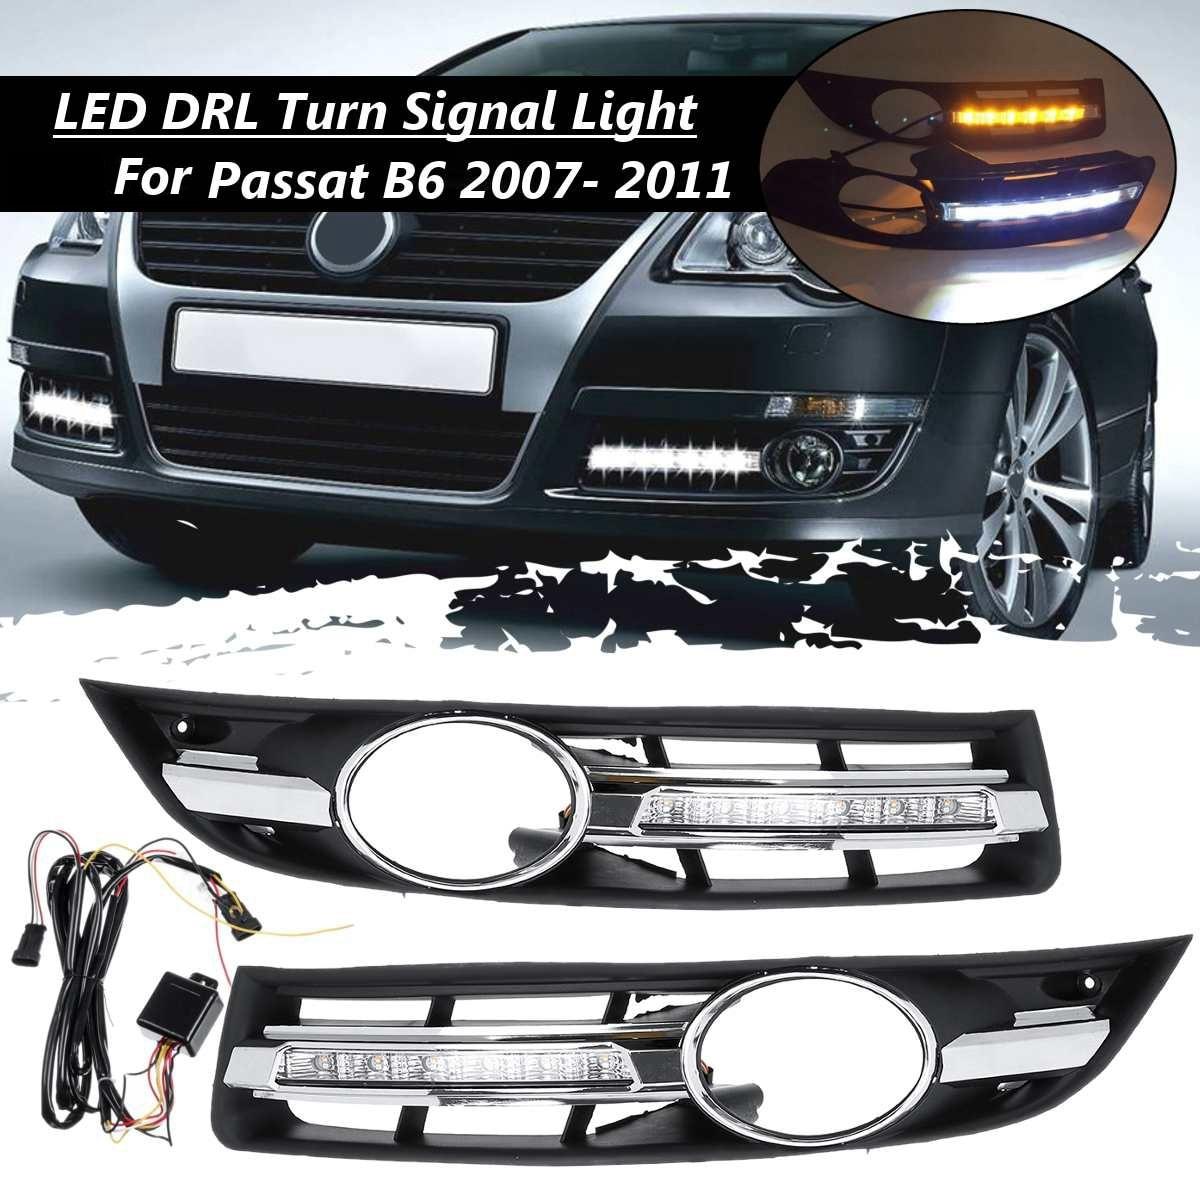 Luz LED DRL para coche, luz diurna con parrilla envolvente para VW Passat B6 2006-2011 impermeable